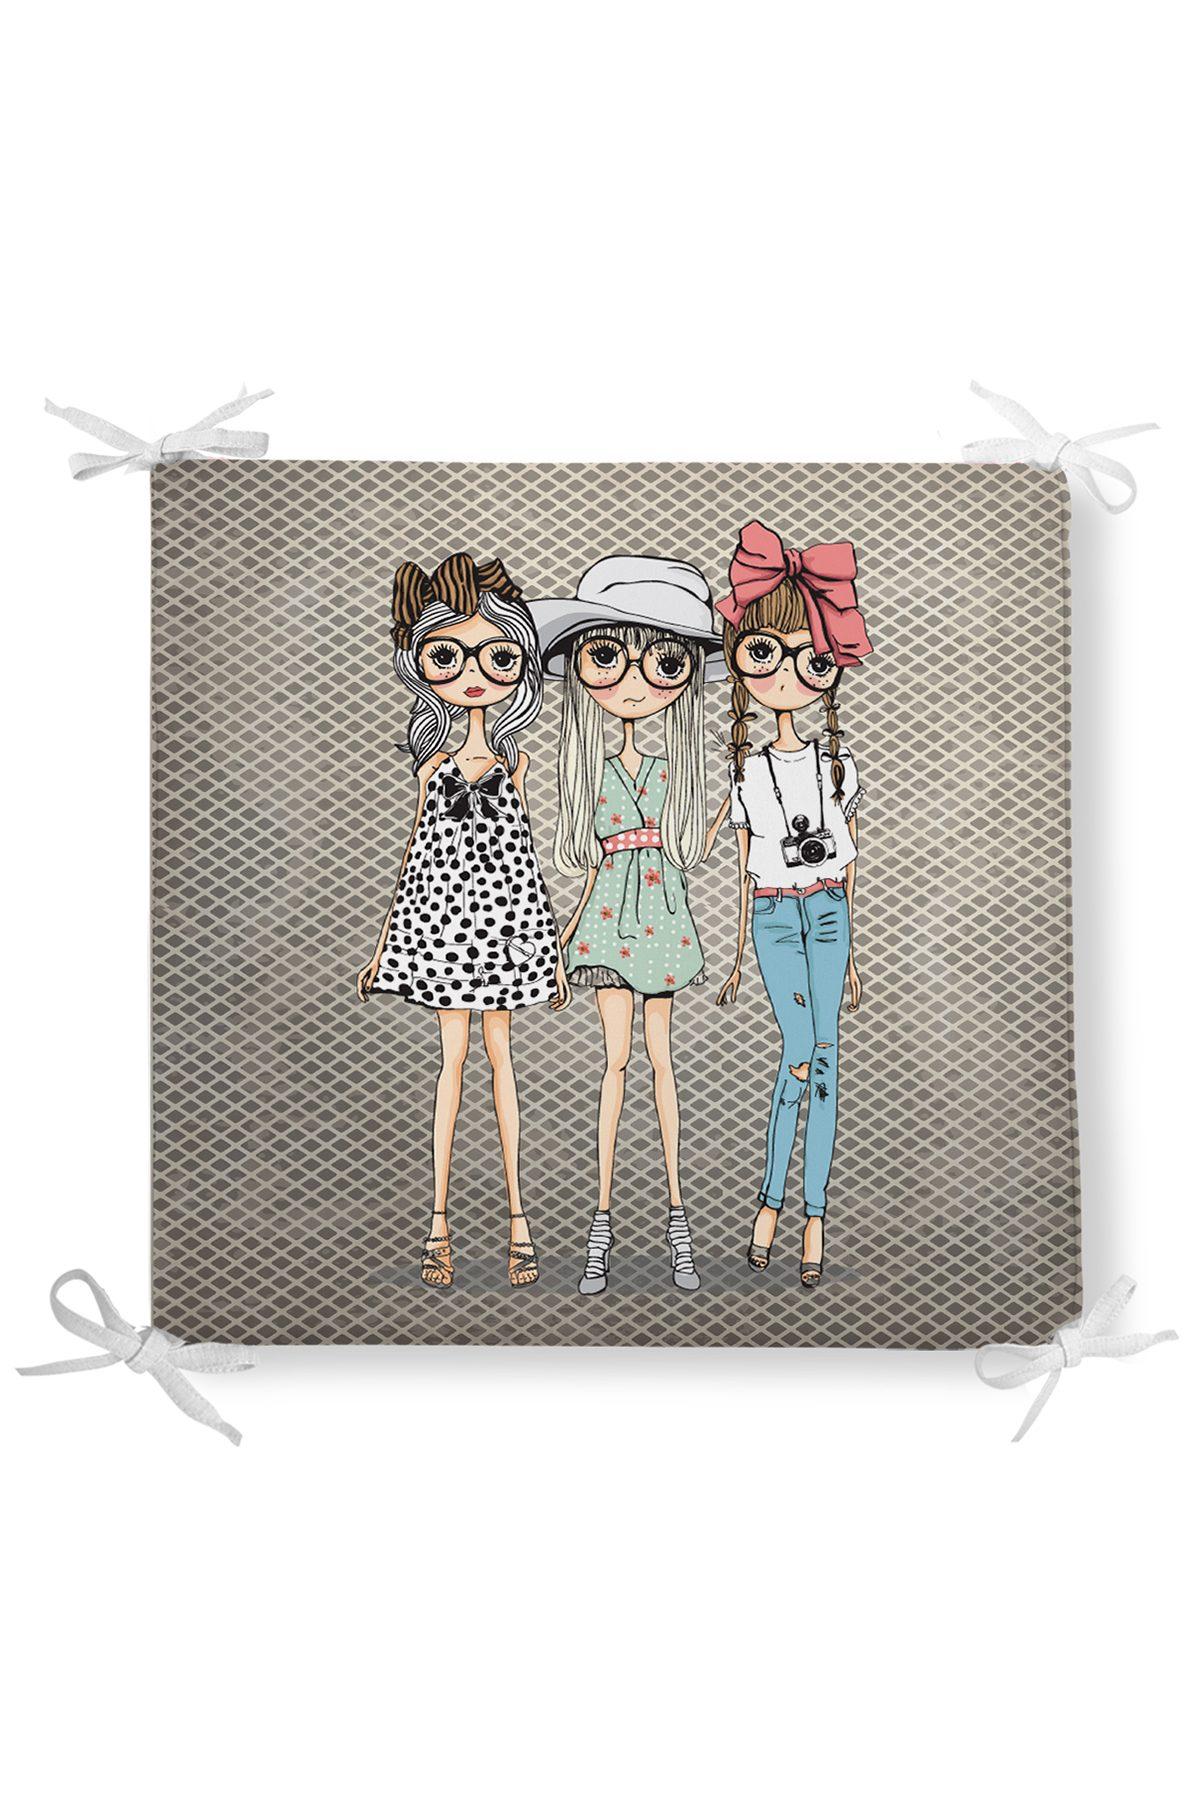 ashion Girls Dekorati Kare Sandalye Minderi 40x40cm ermuarlı Realhomes